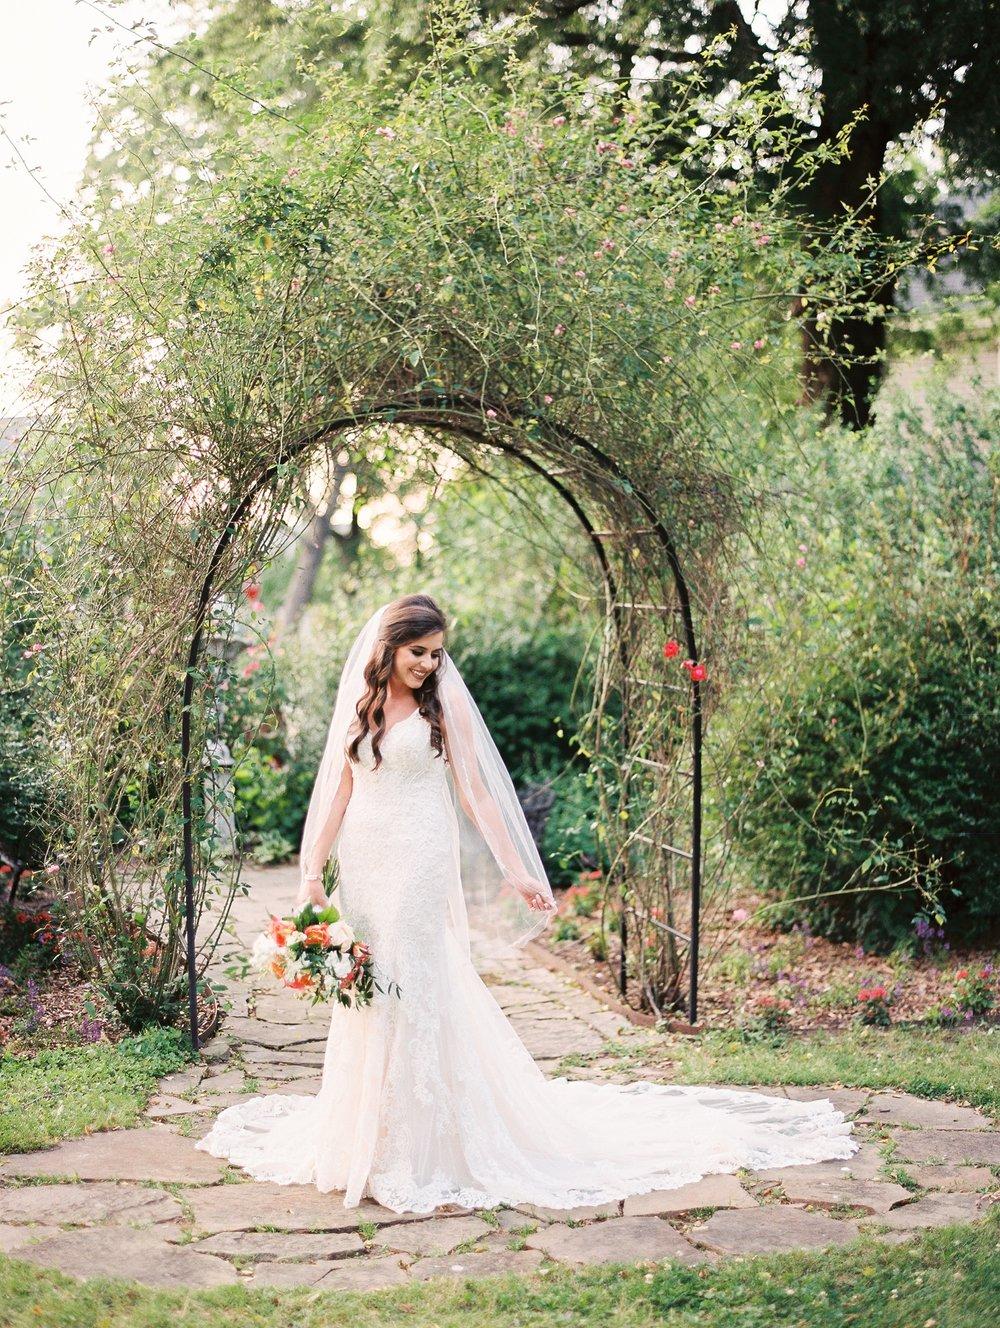 The-Terry-House-Wedding-Little-Rock-Arkansas_0075.jpg